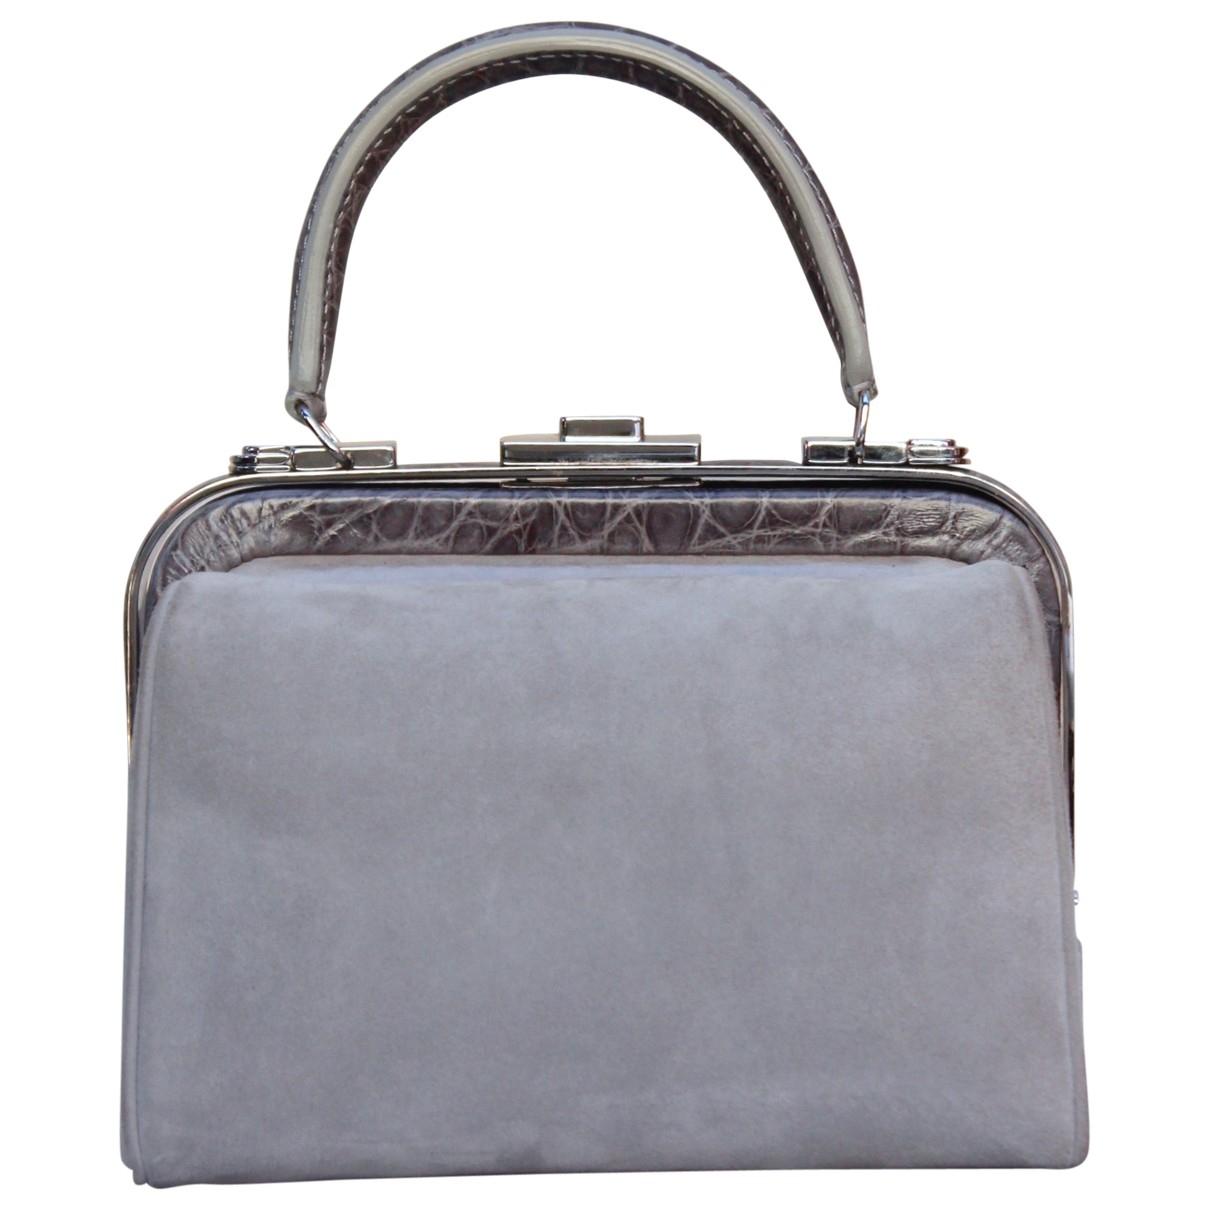 Giorgio Armani \N Handtasche in  Grau Leder